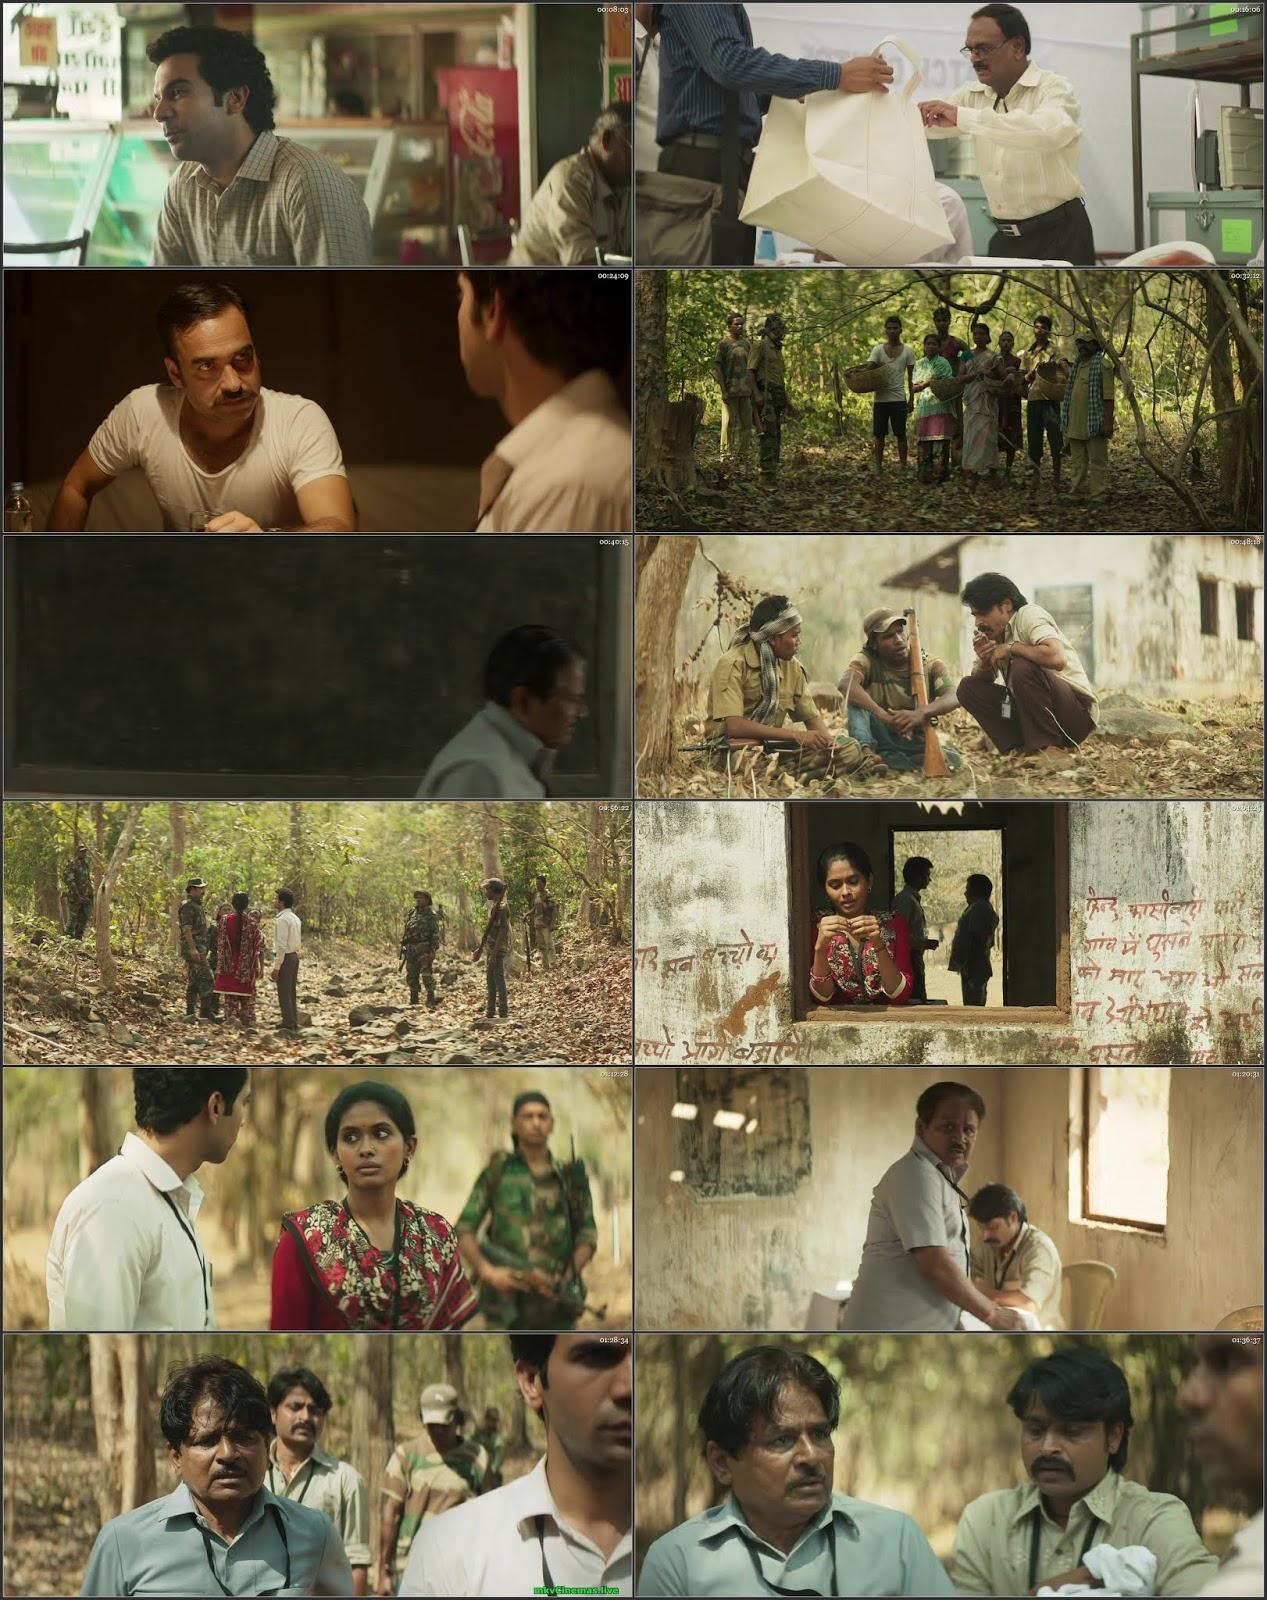 Newton 2017 Hindi Full Movie BluRay 720p ESubs 900MB